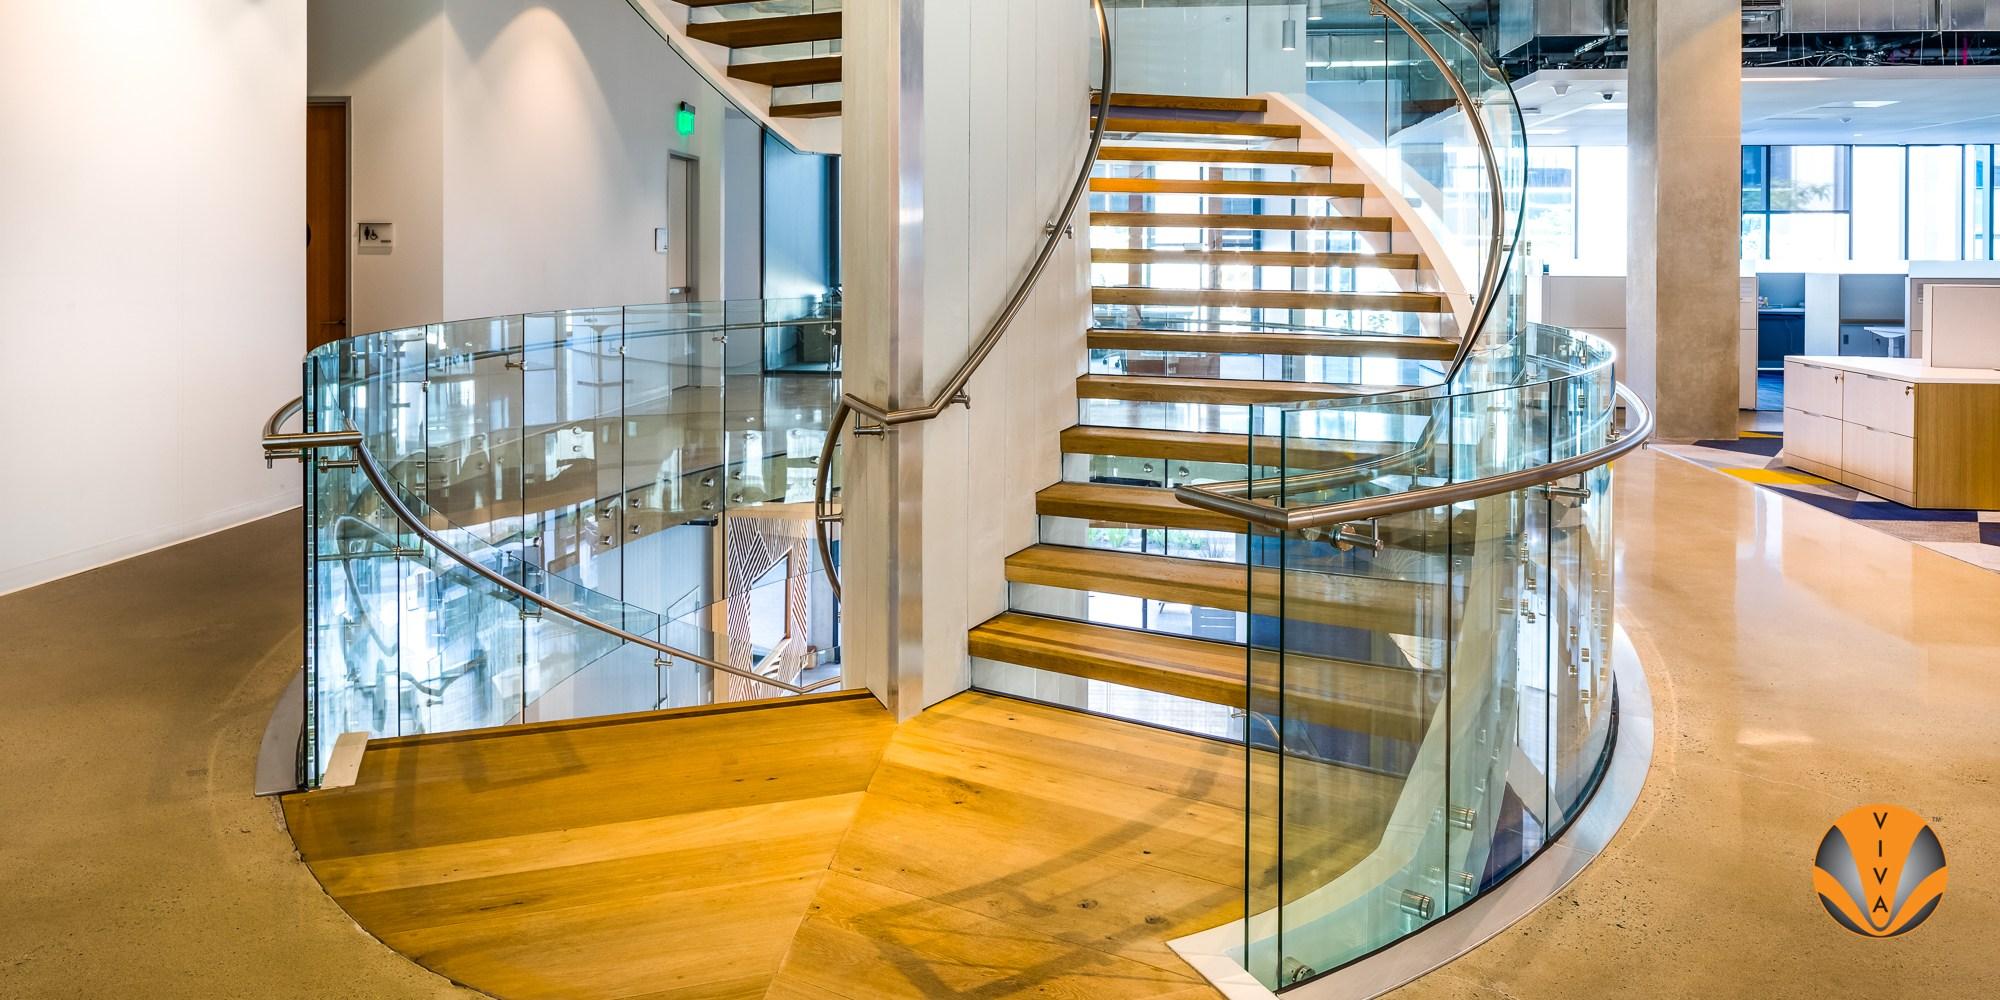 Viva Railings — Architectural Insider Llc | Curved Glass Staircase Railing | Half Circle | Aluminium | Tuffen | Interior Modern Glass | Stone Glass